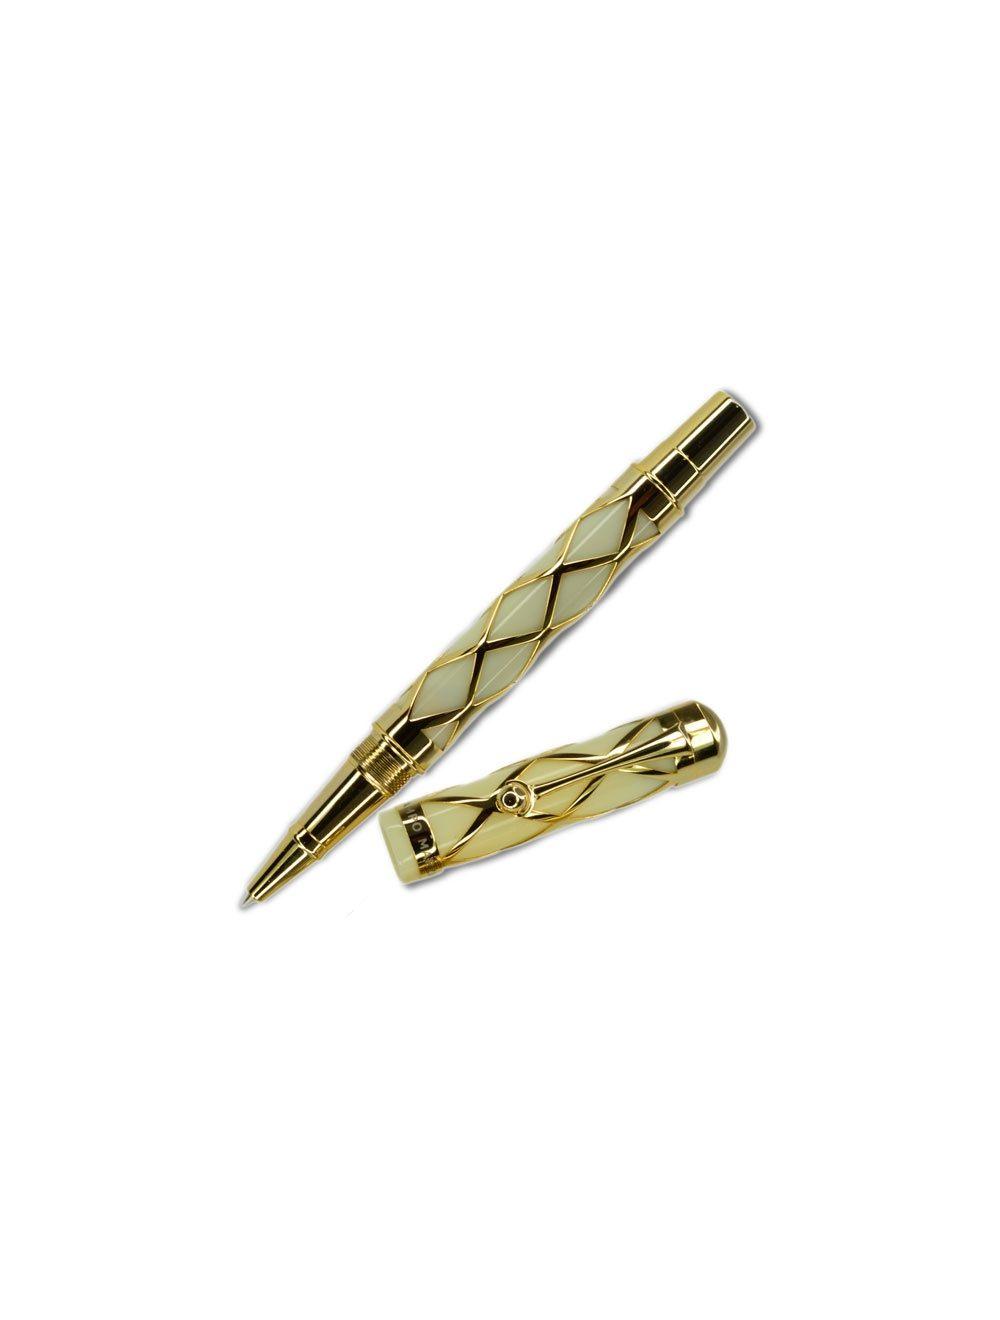 Bohemian Style Roller Pen - Gold White